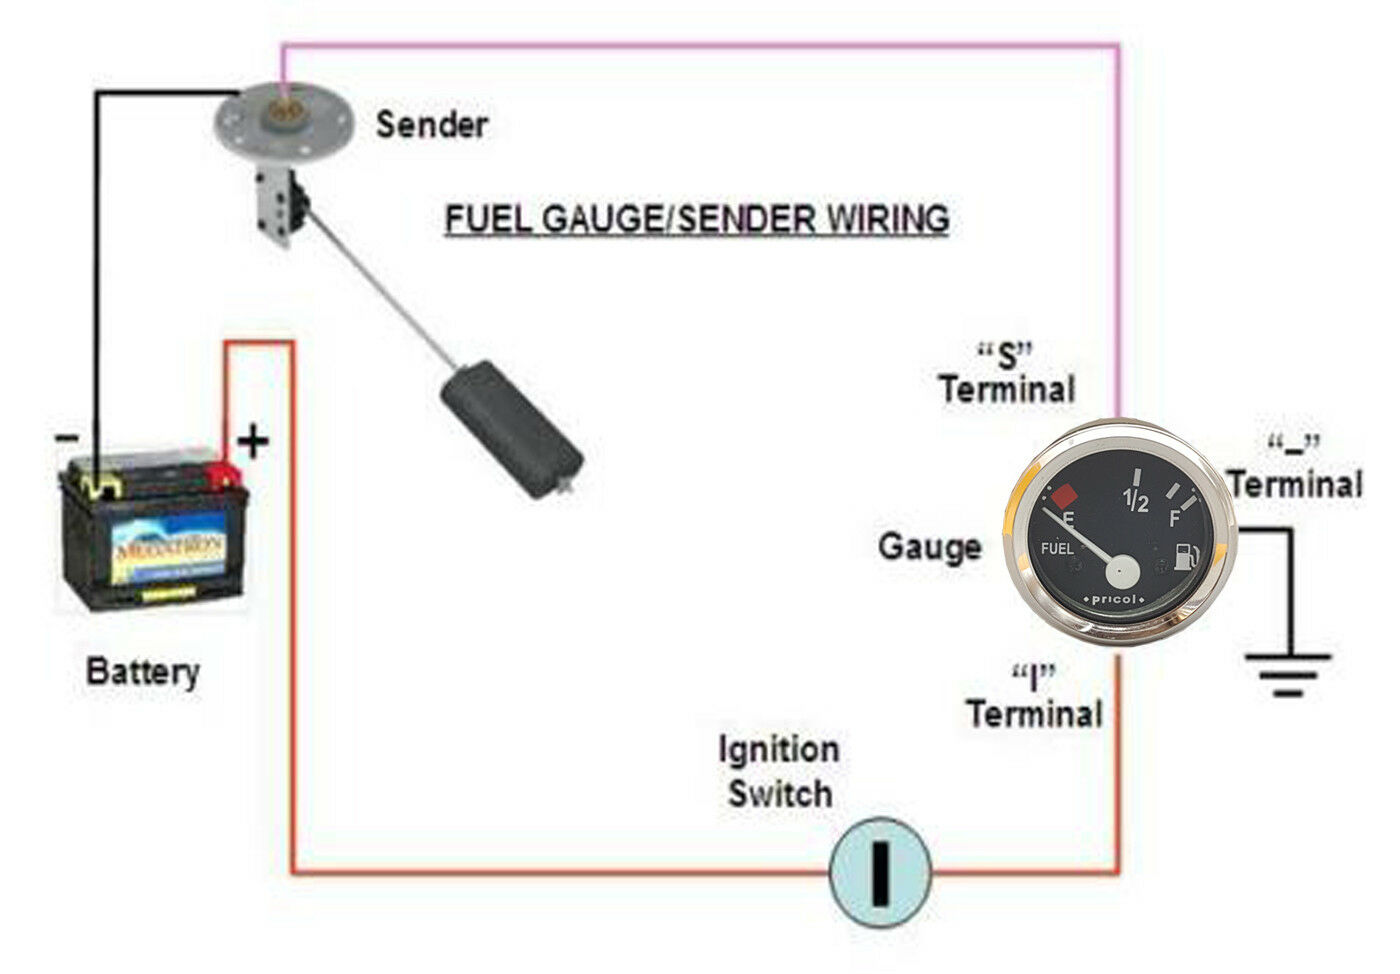 Audi Fuel Gauge Wiring - Wiring Diagram All skip-large -  skip-large.huevoprint.it